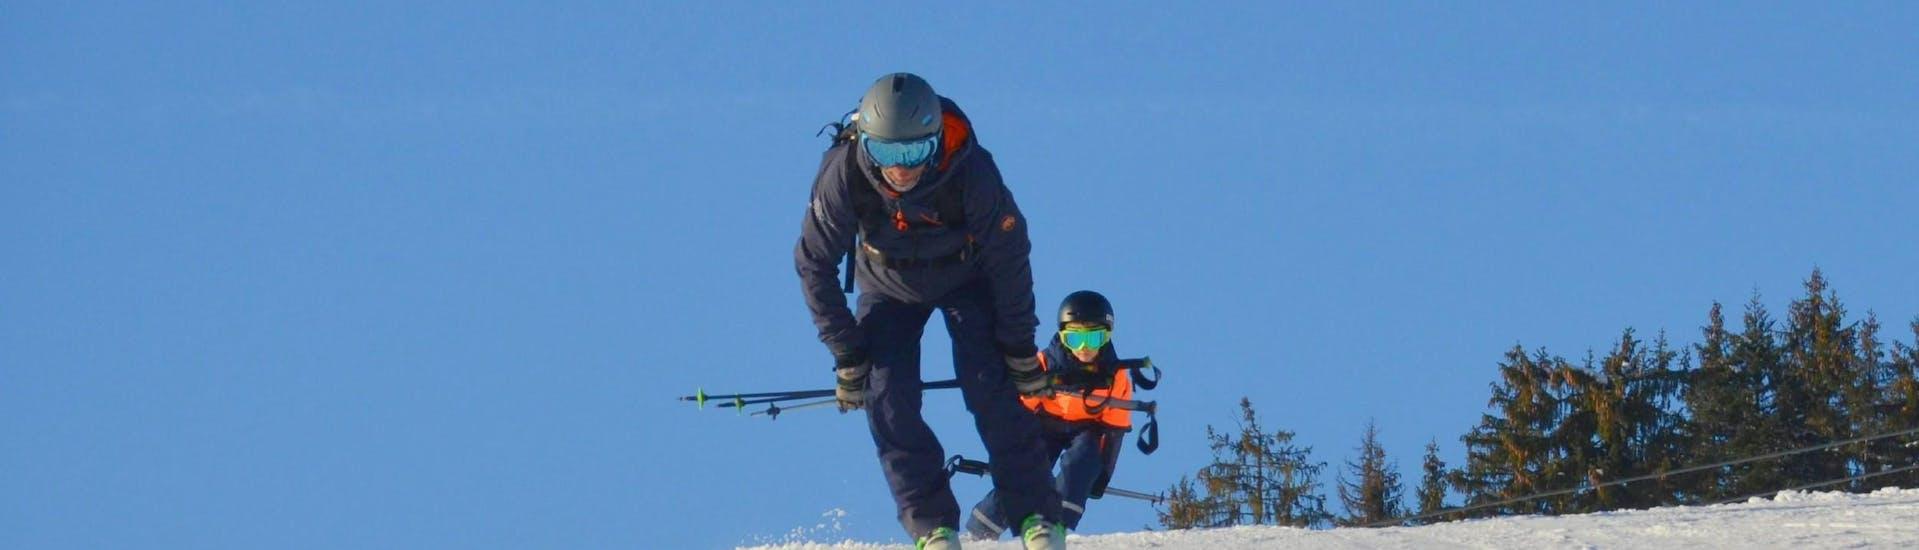 Privater Kinder-Skikurs (ab 4 J.) mit Skisportschule Mountainmind Söll - Hero image